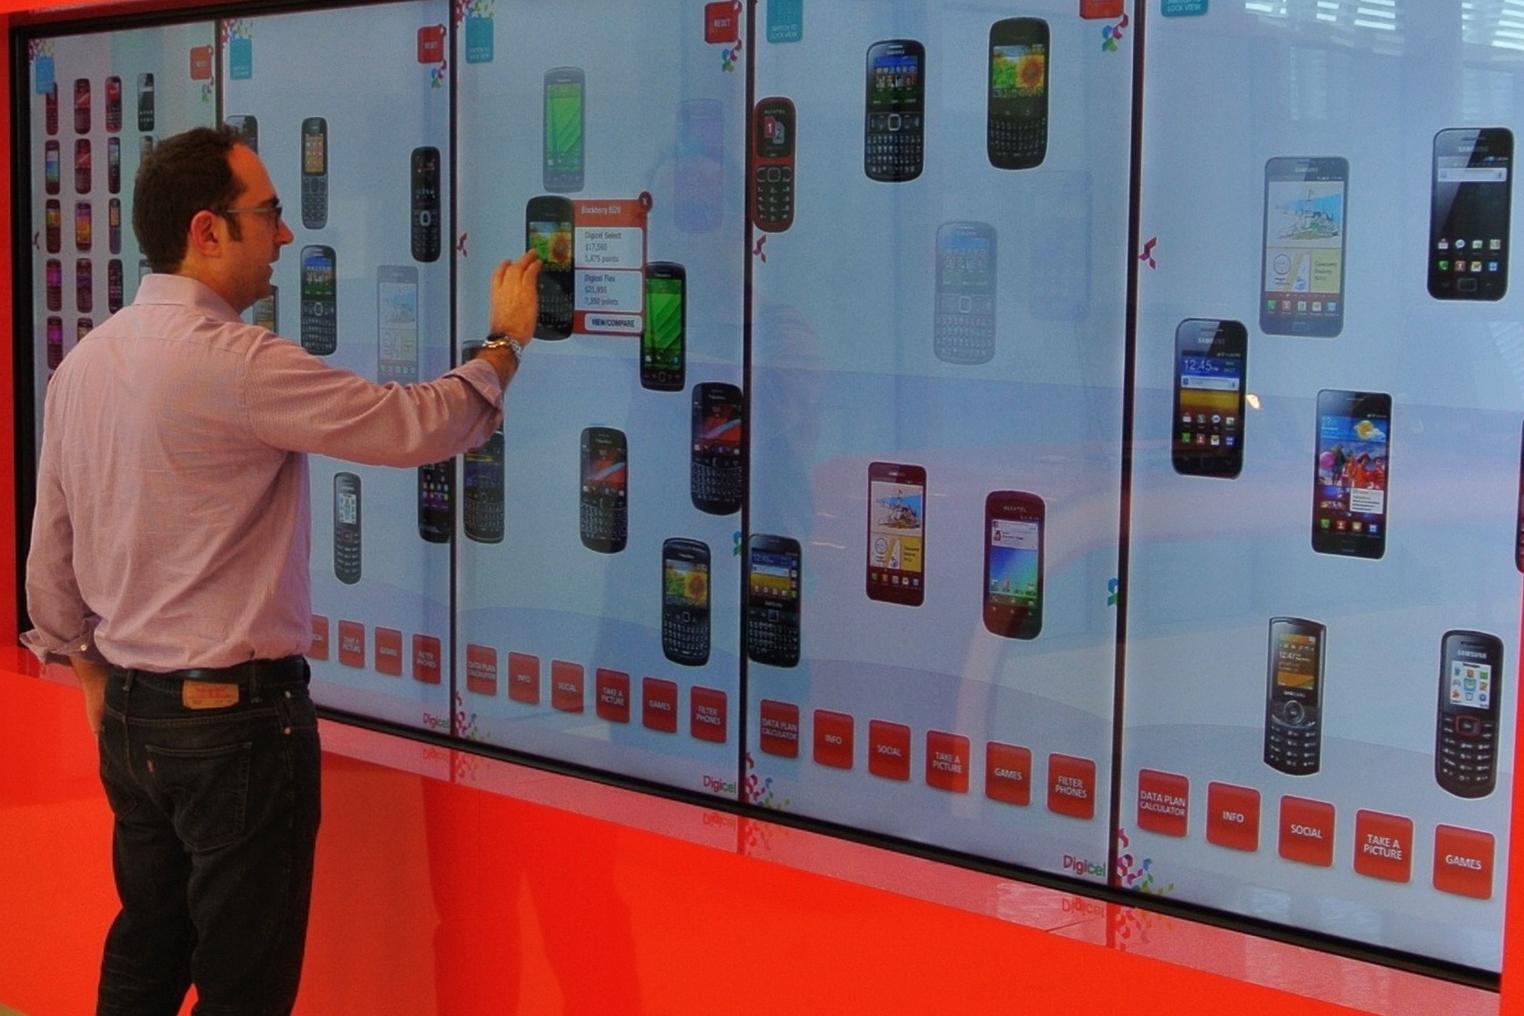 Продажи смартфонов в 2016 г. выросли на 26%, а средняя цена на 21%